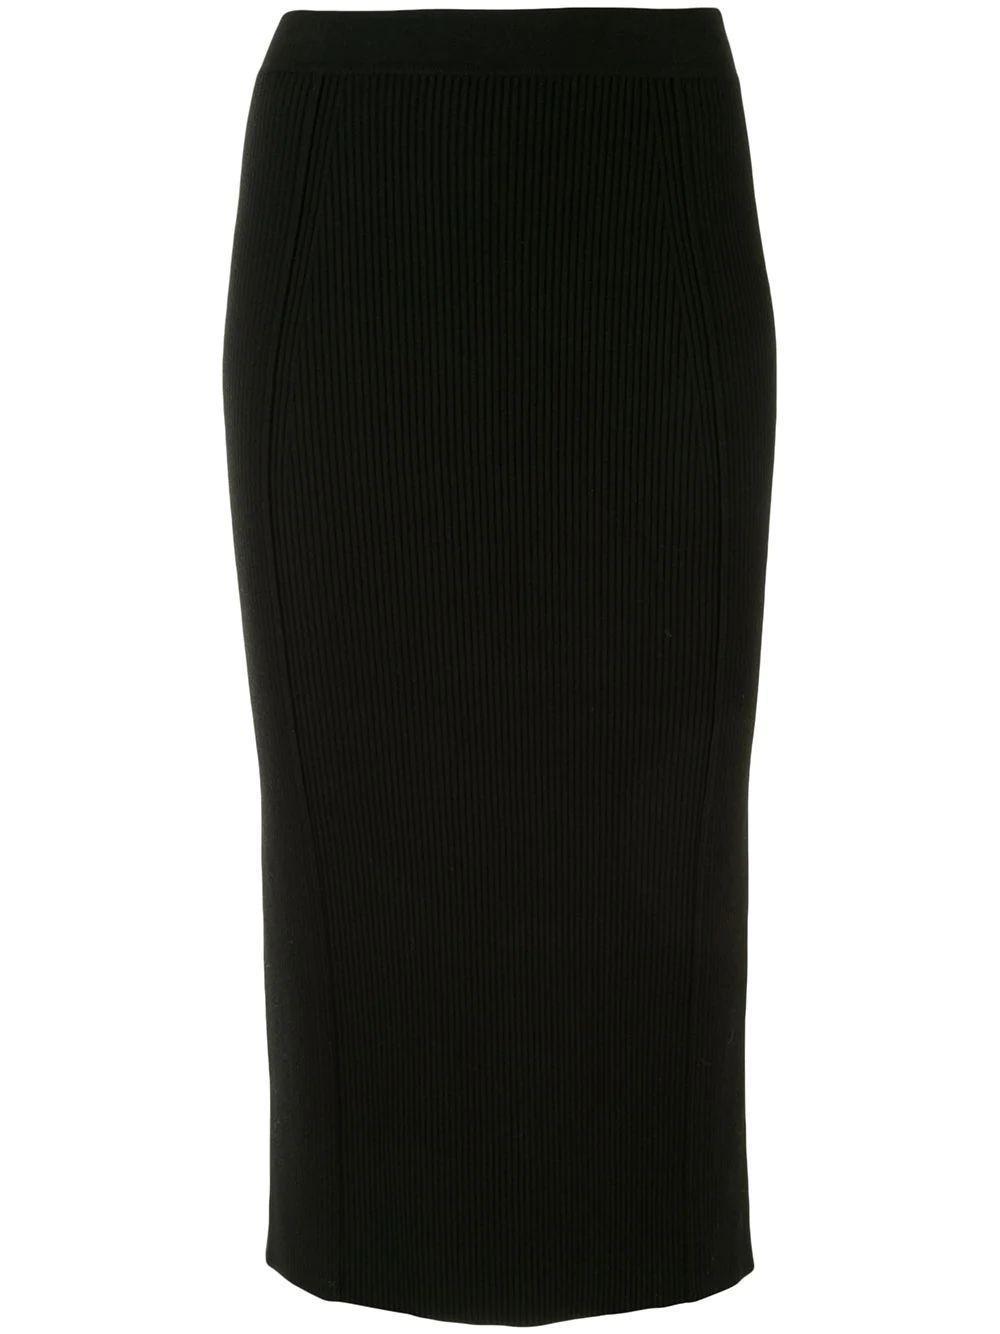 Sienna Midi Skirt Item # 420-3011-K